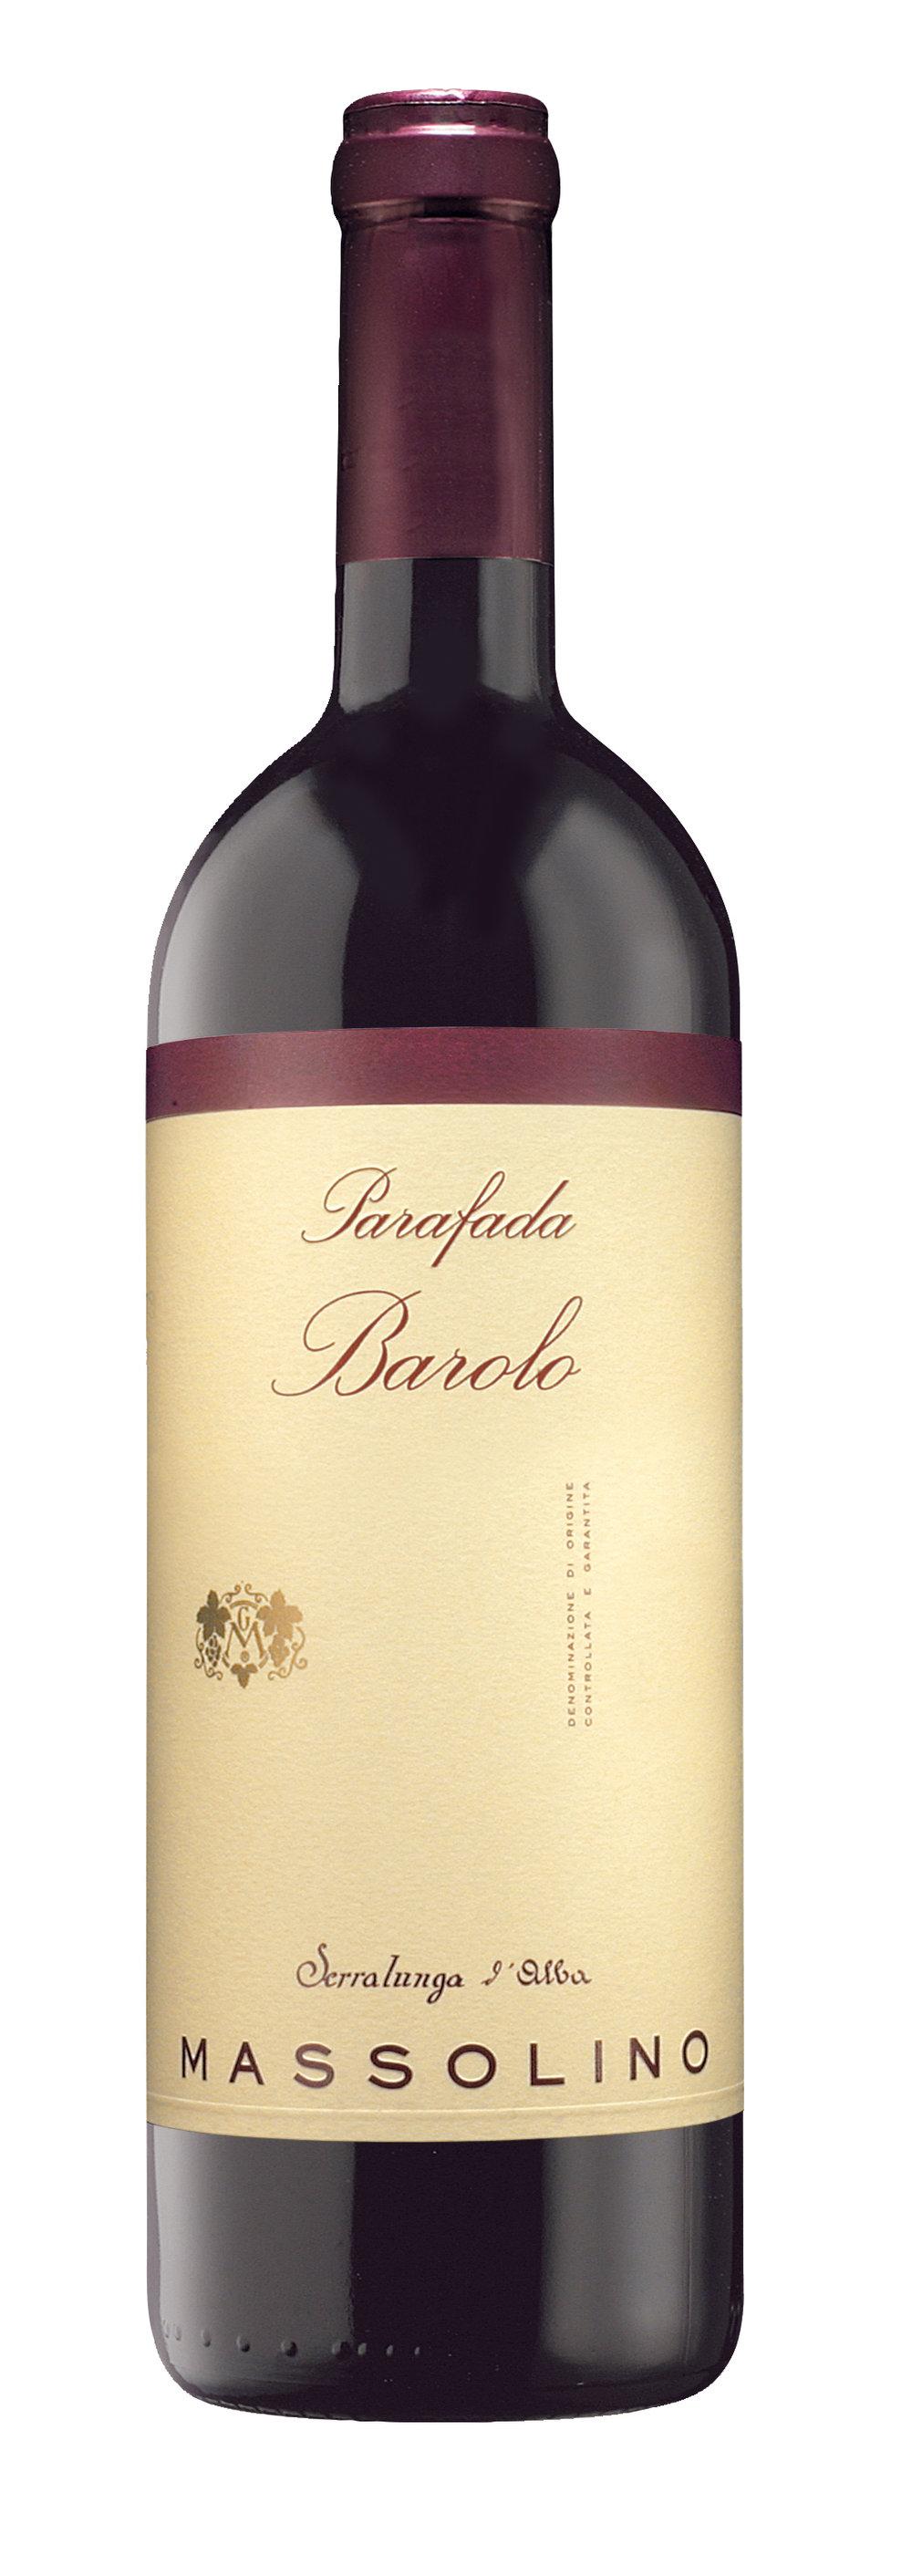 Massolino Parafada Barolo Bottle.jpg